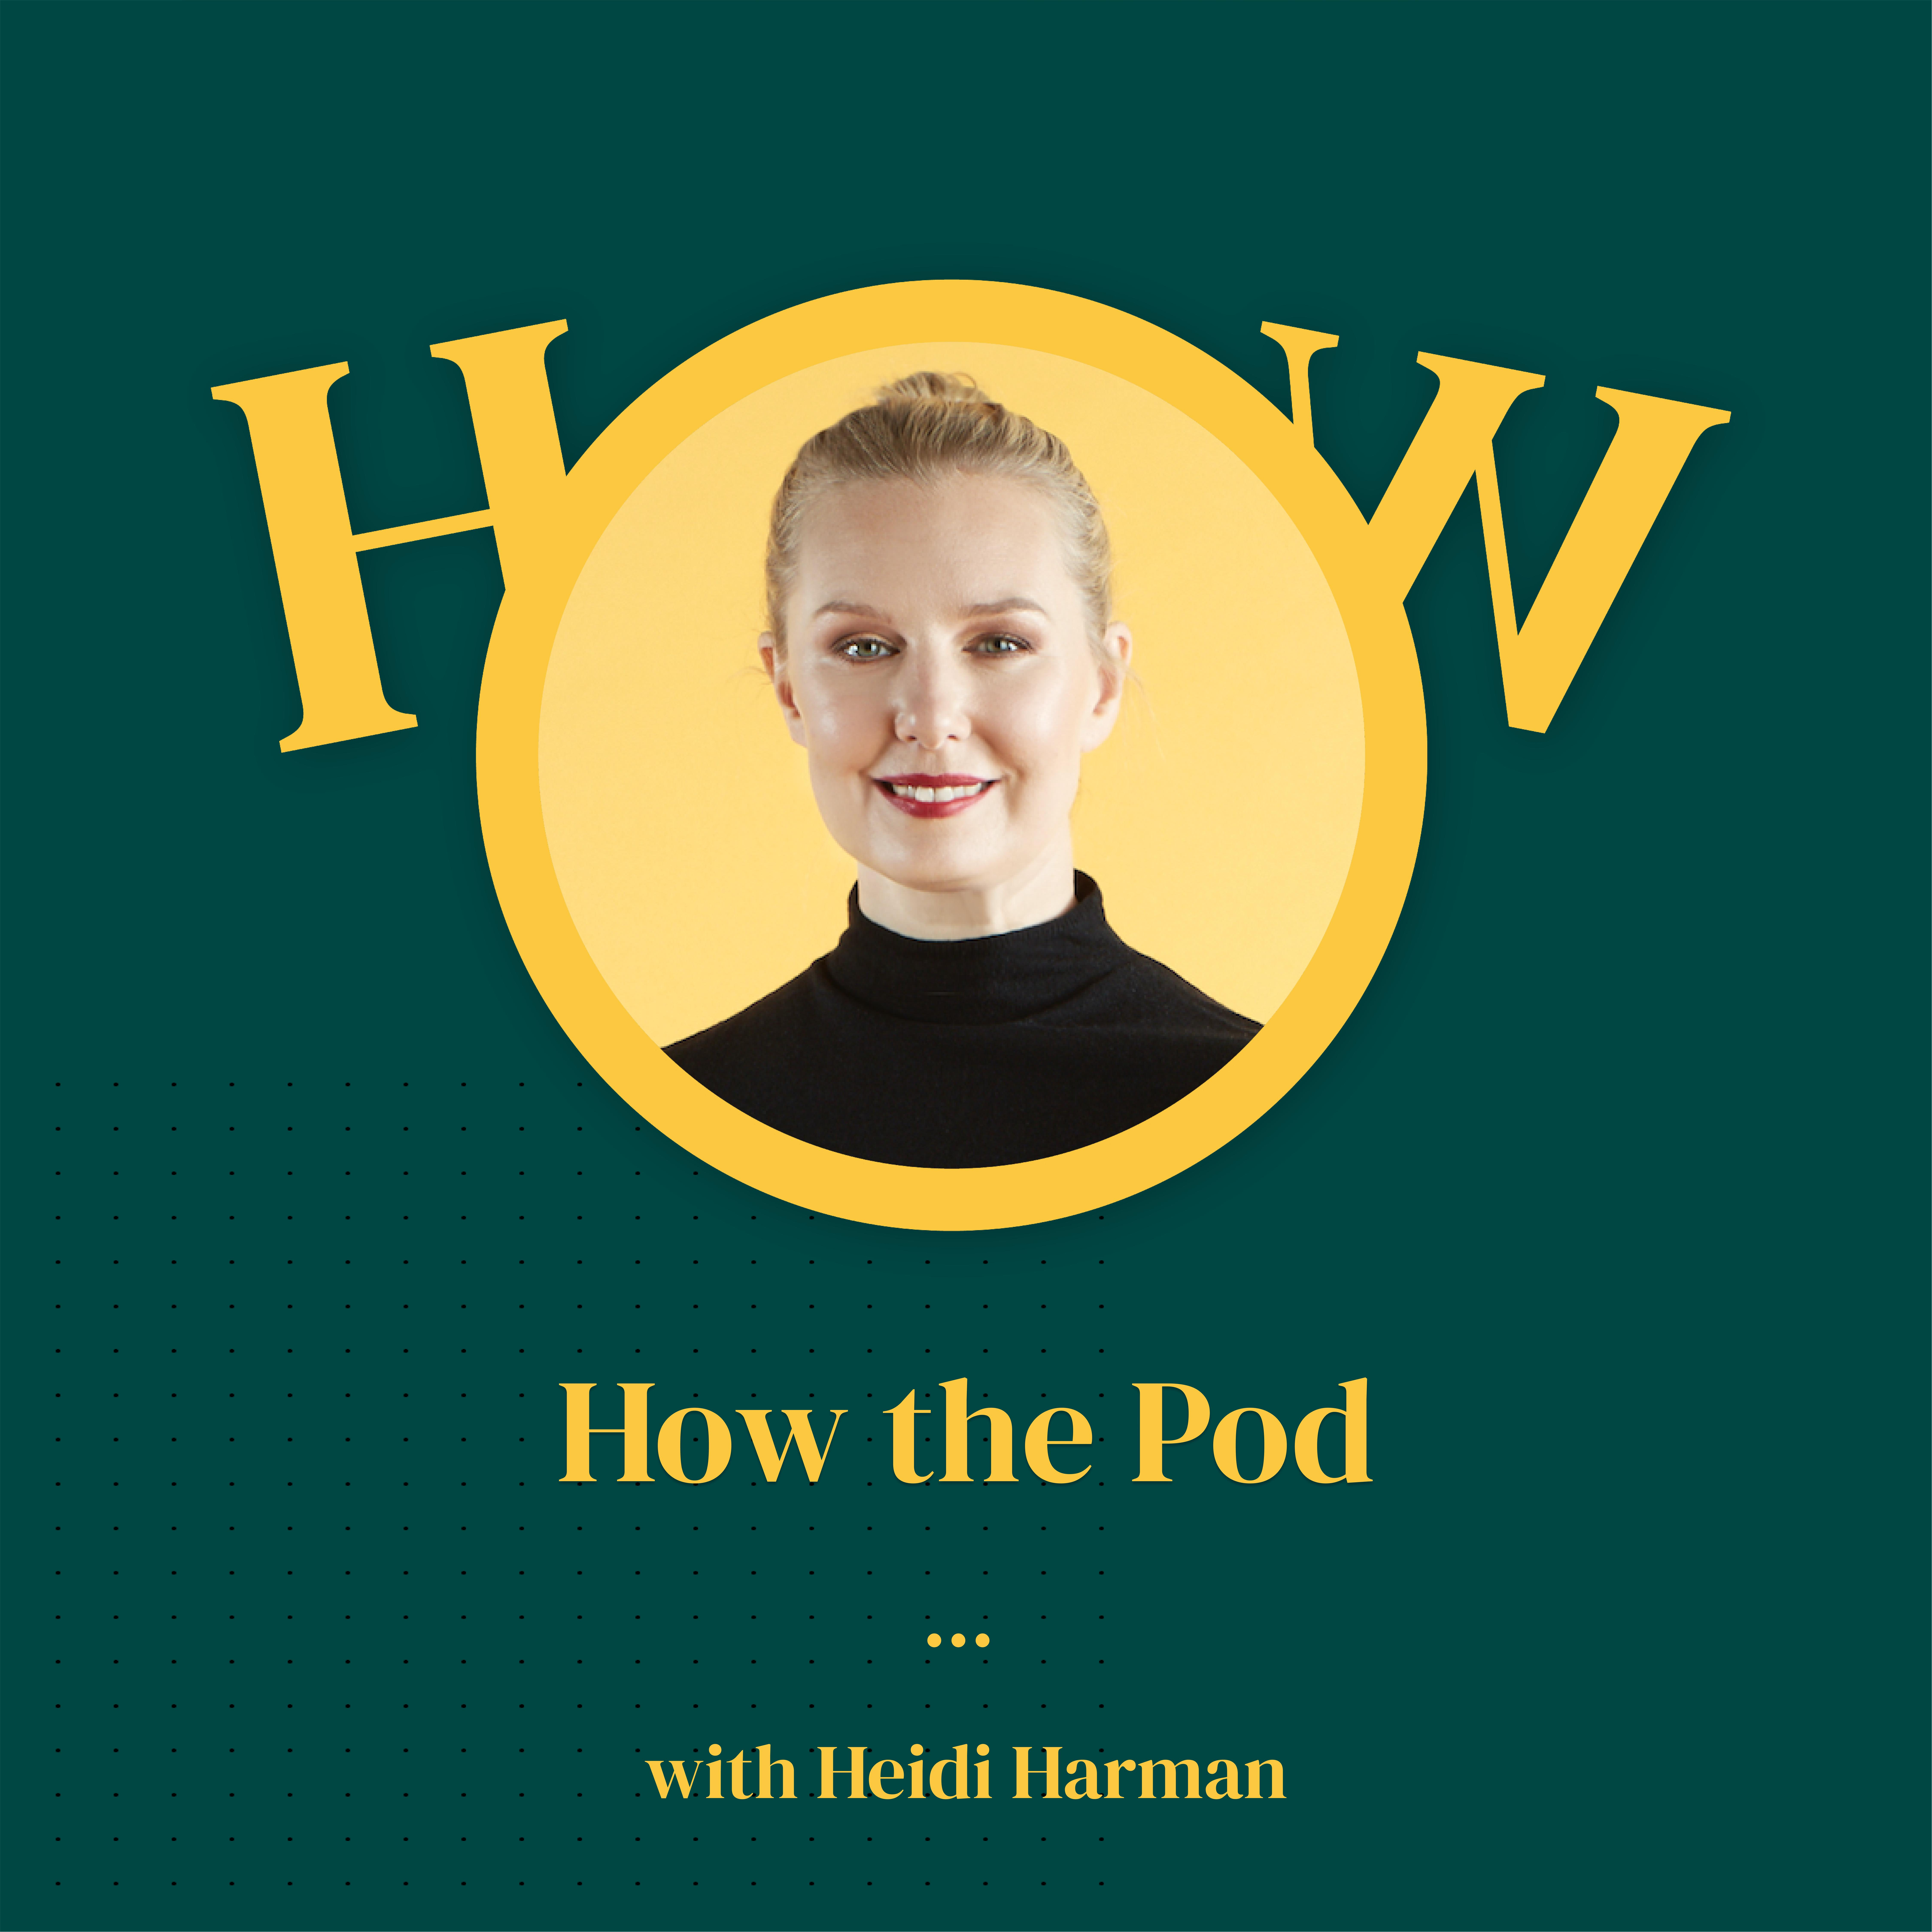 Heidi Harman